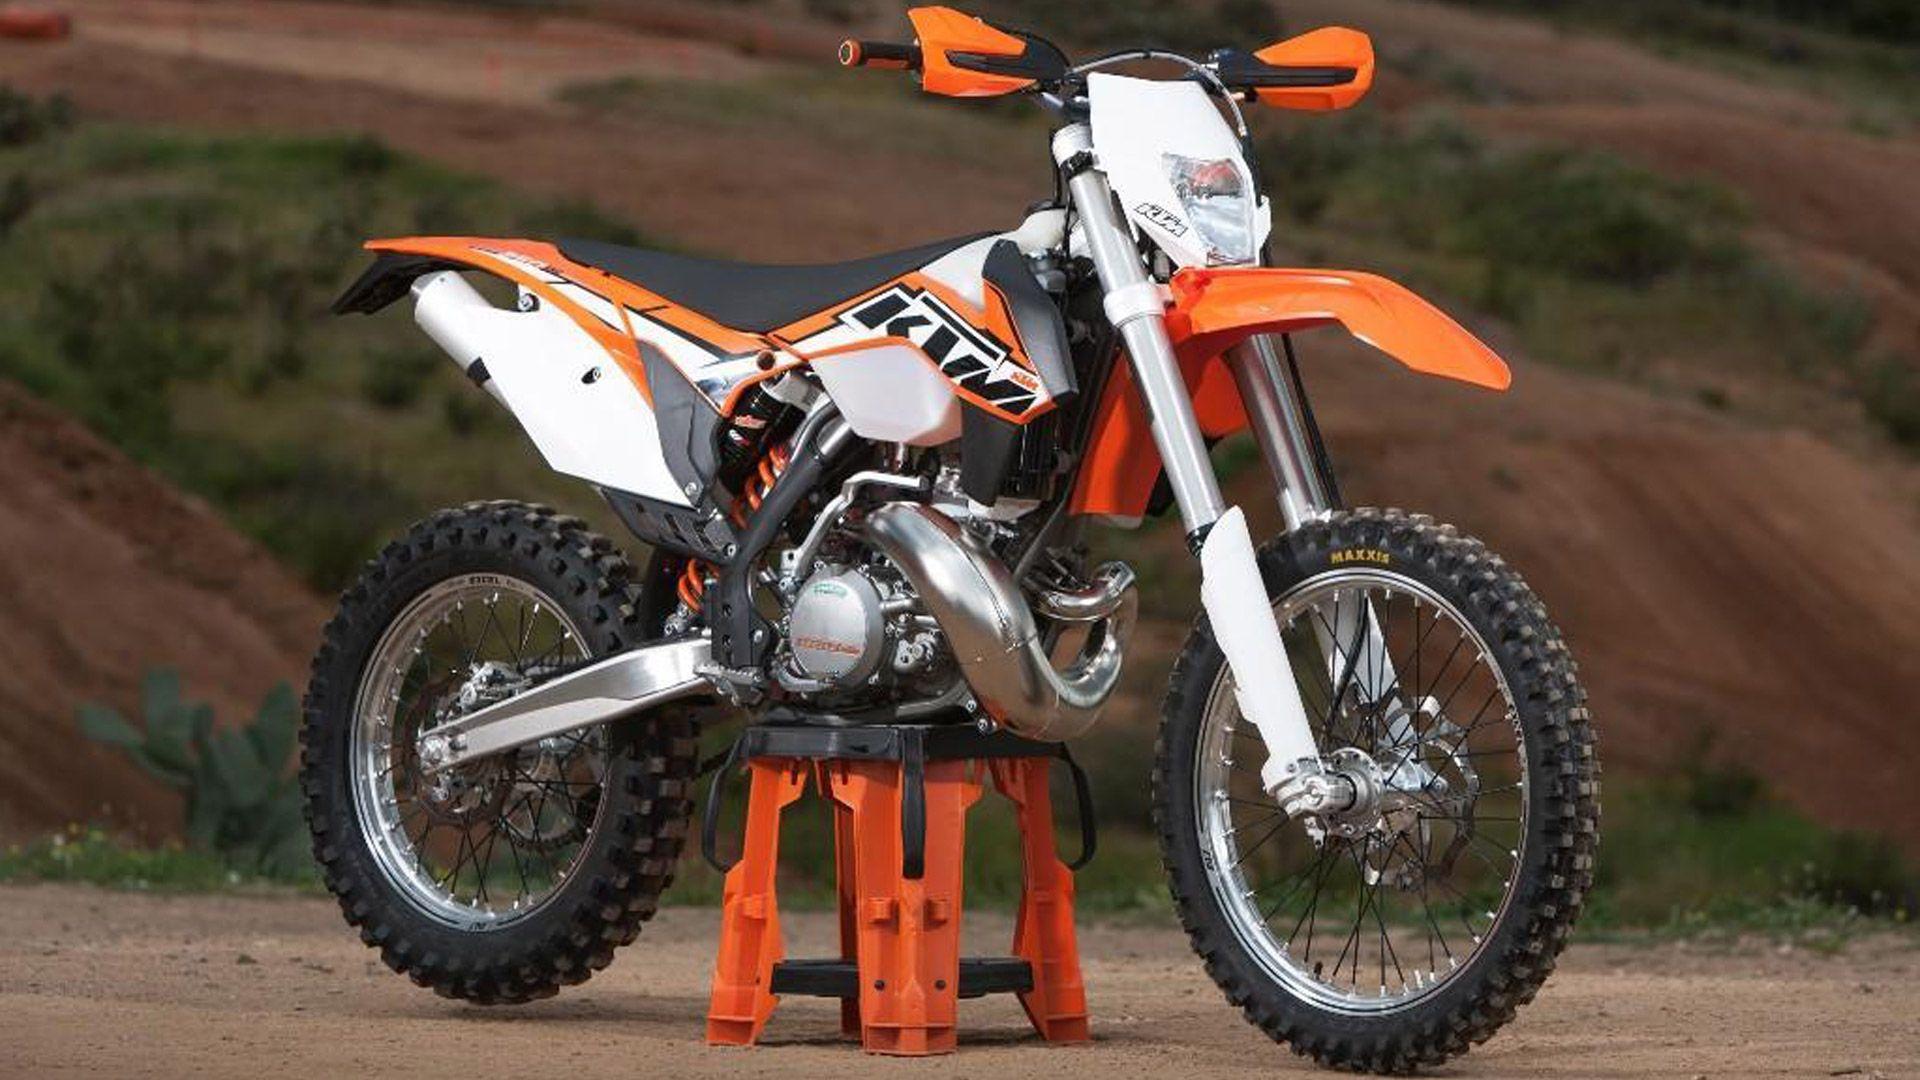 2014 Ktm 250 Xc W Specs And Review Ktm Ktm 250 Dirtbikes